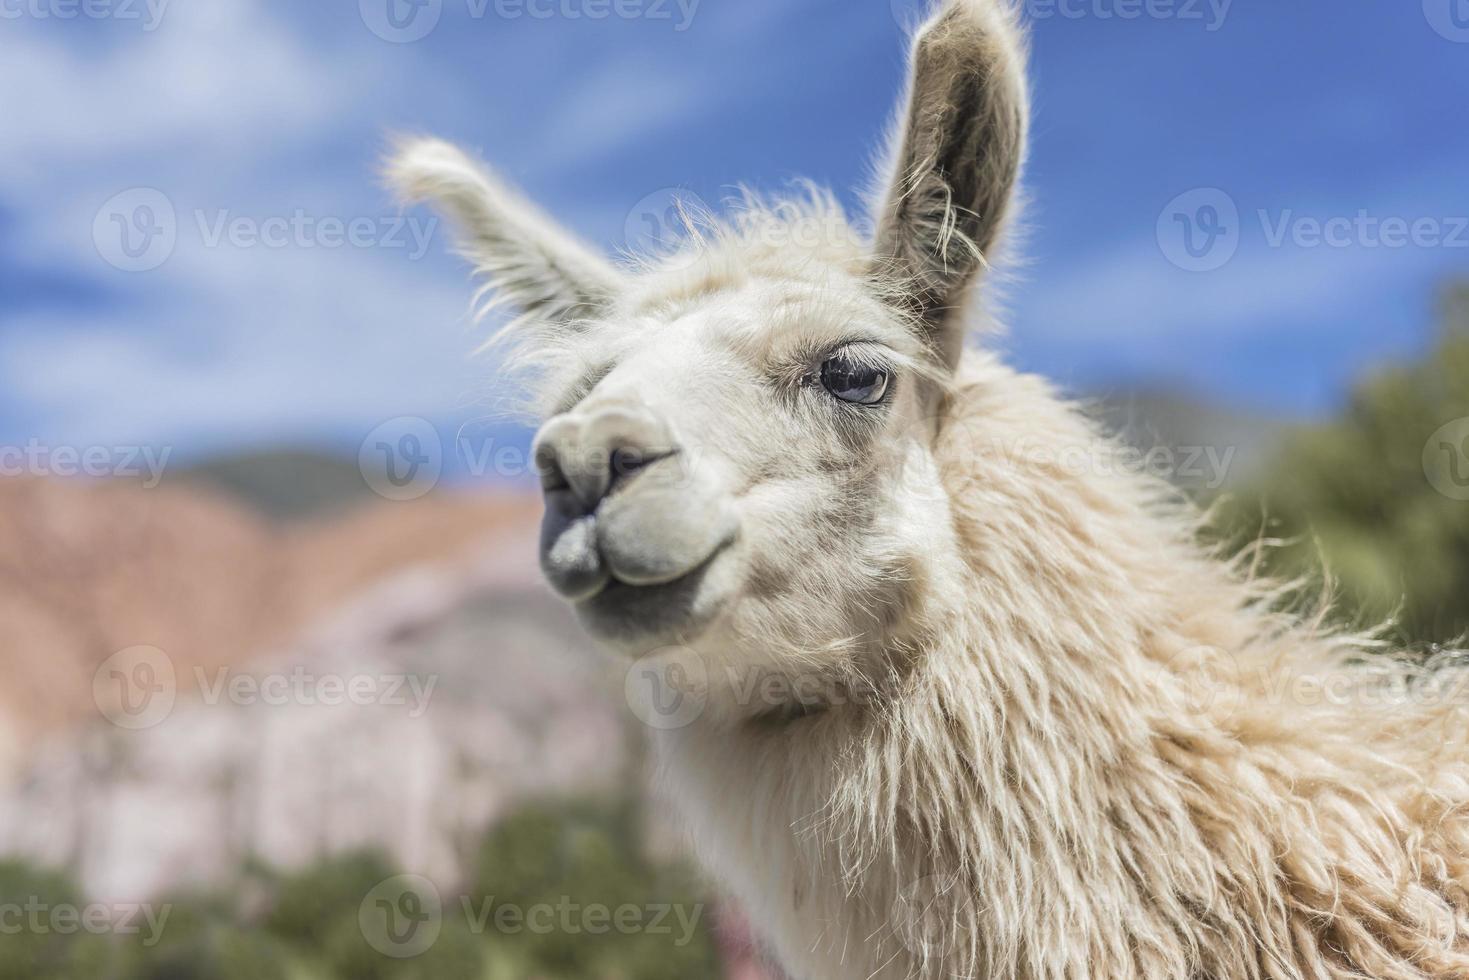 lhama em purmamarca, jujuy, argentina. foto